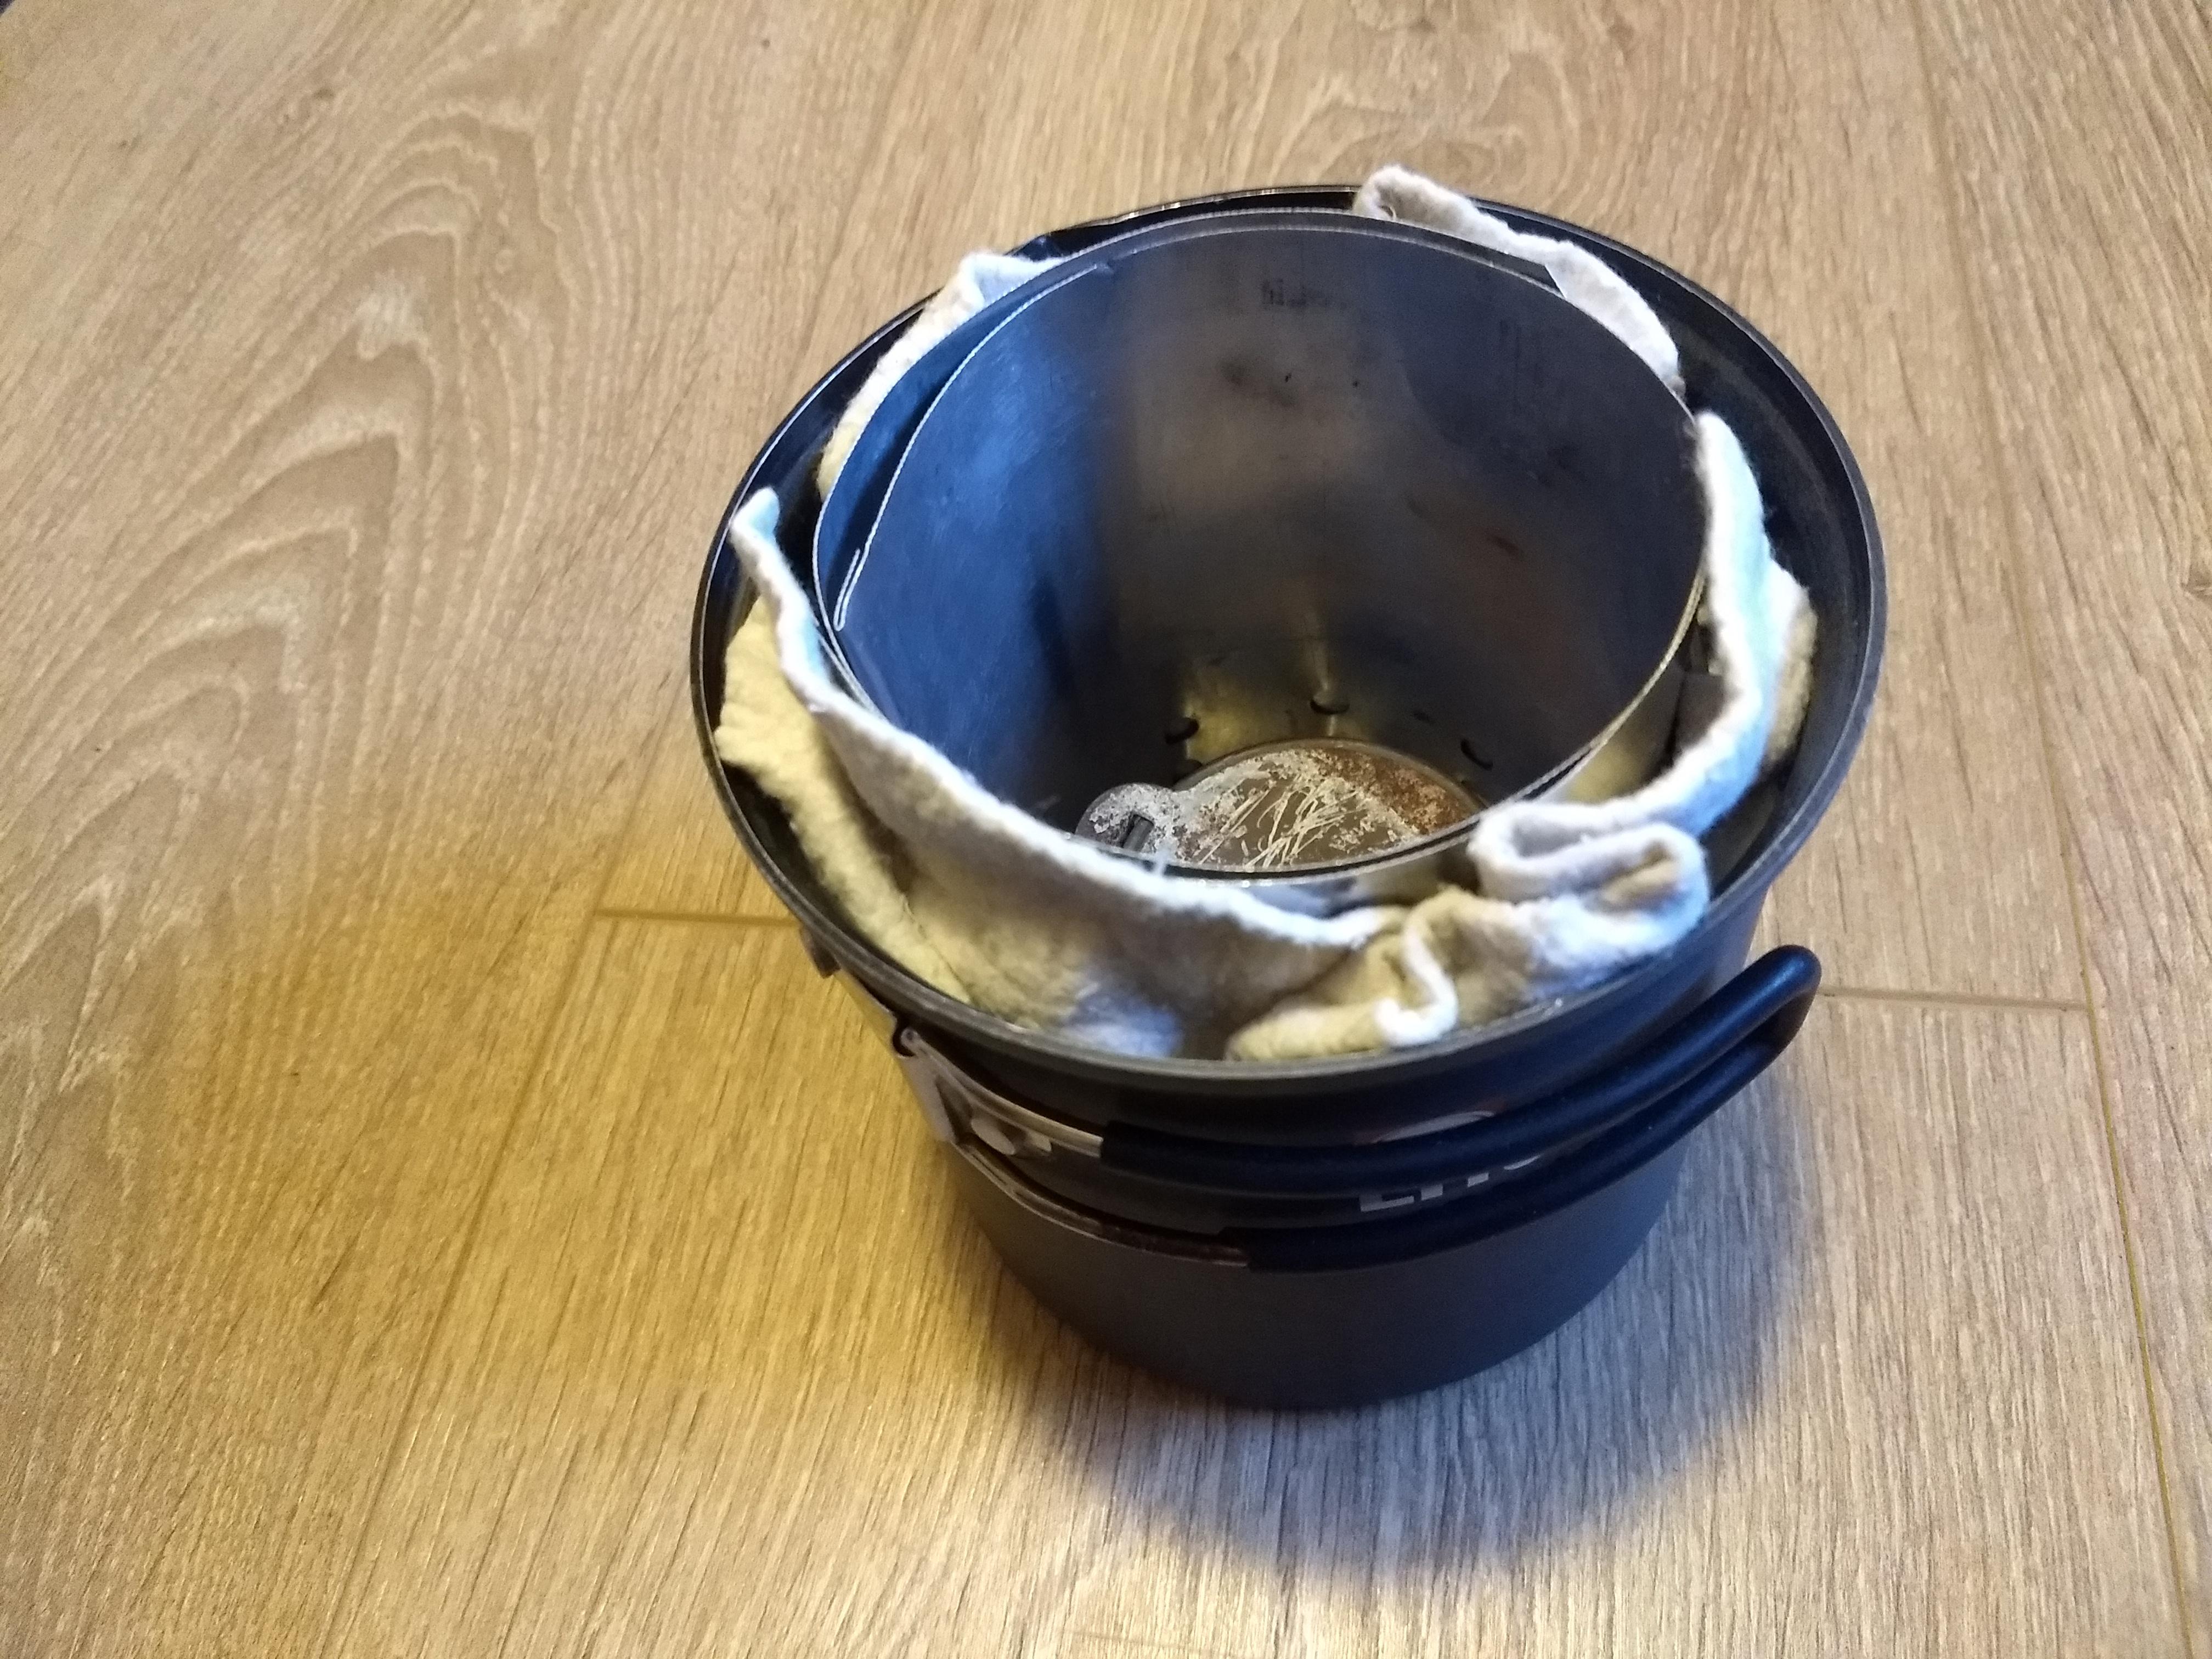 Small Dish Cloth for Padding